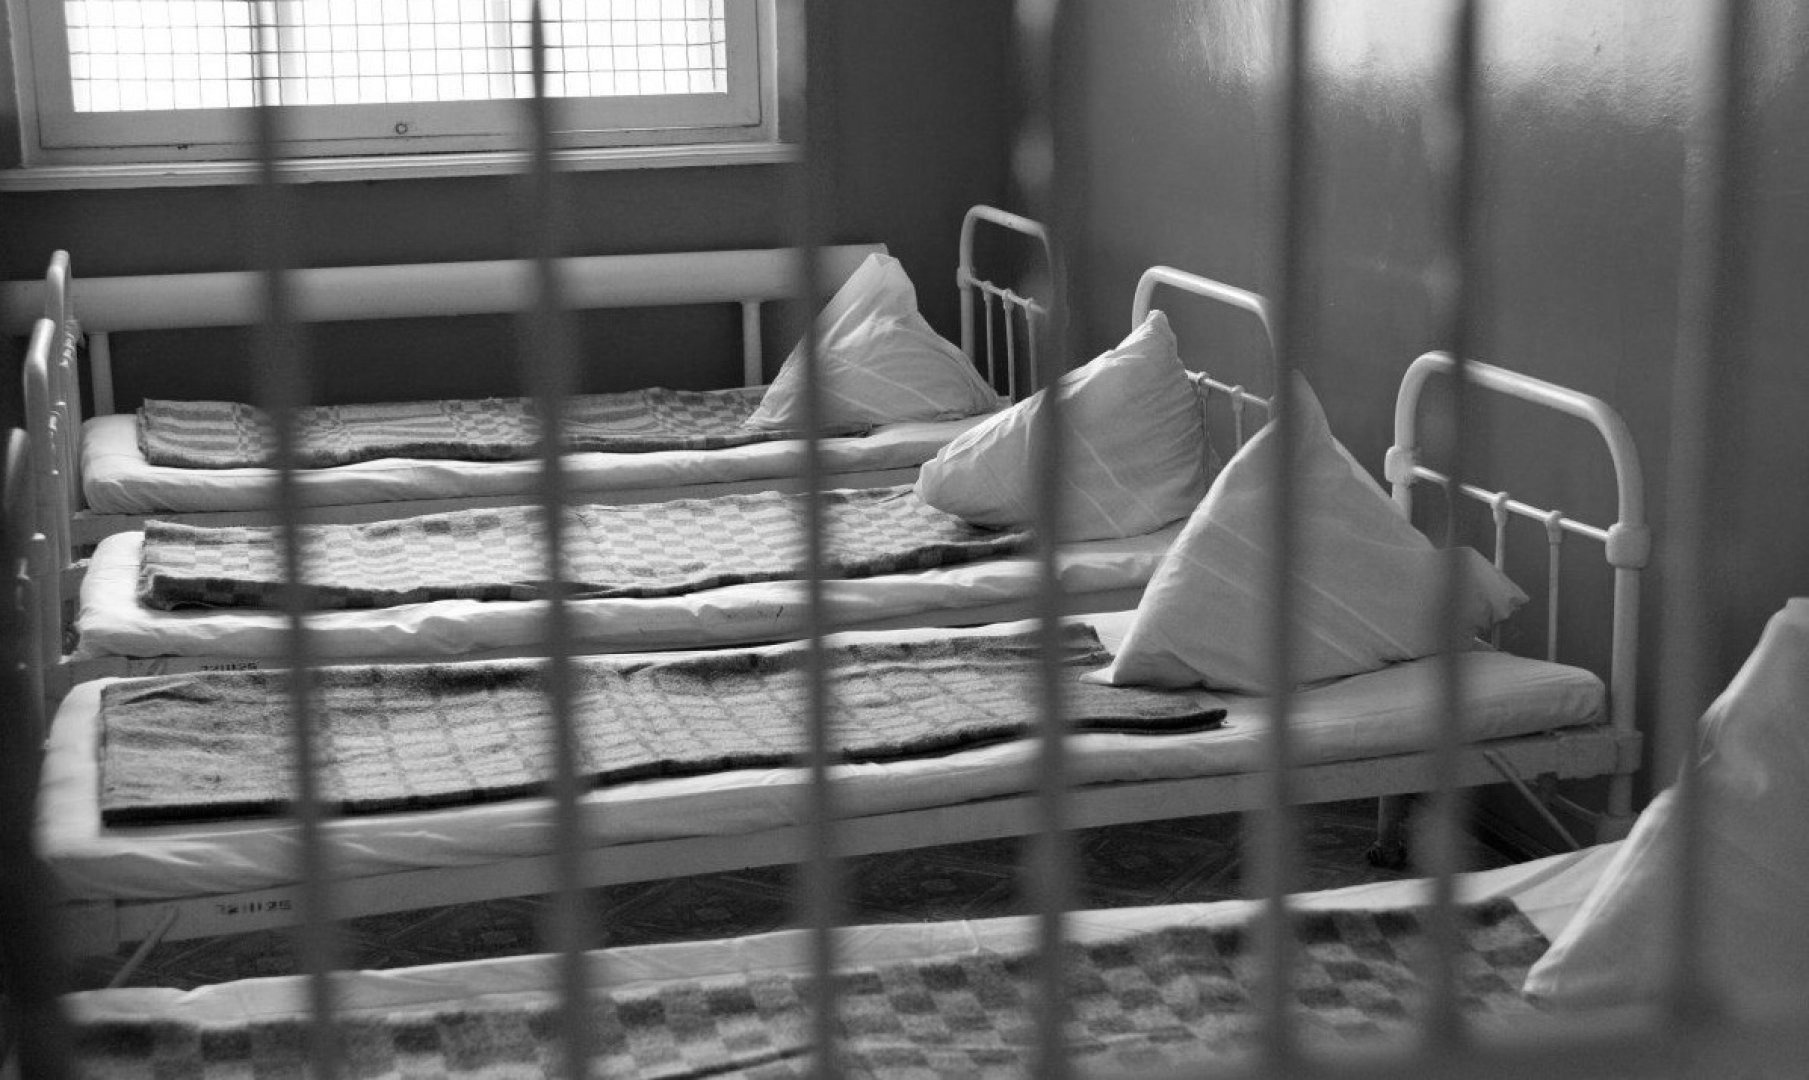 Астраханец избил и поджег  мужа сестры